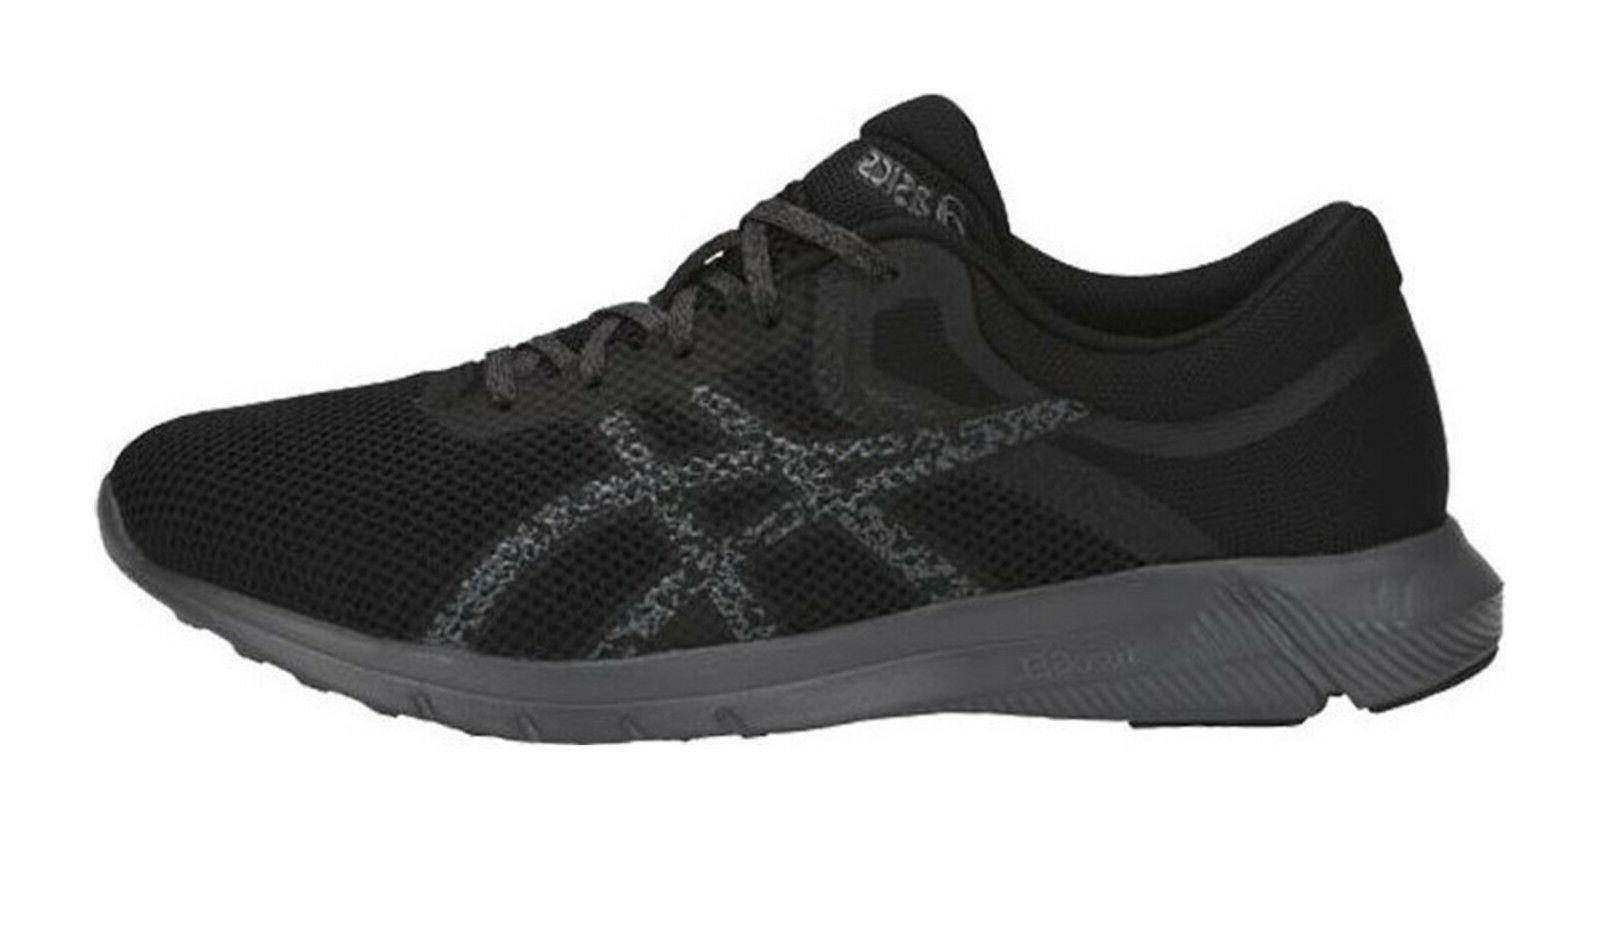 mens running shoes nitrofuze 2 carbon black